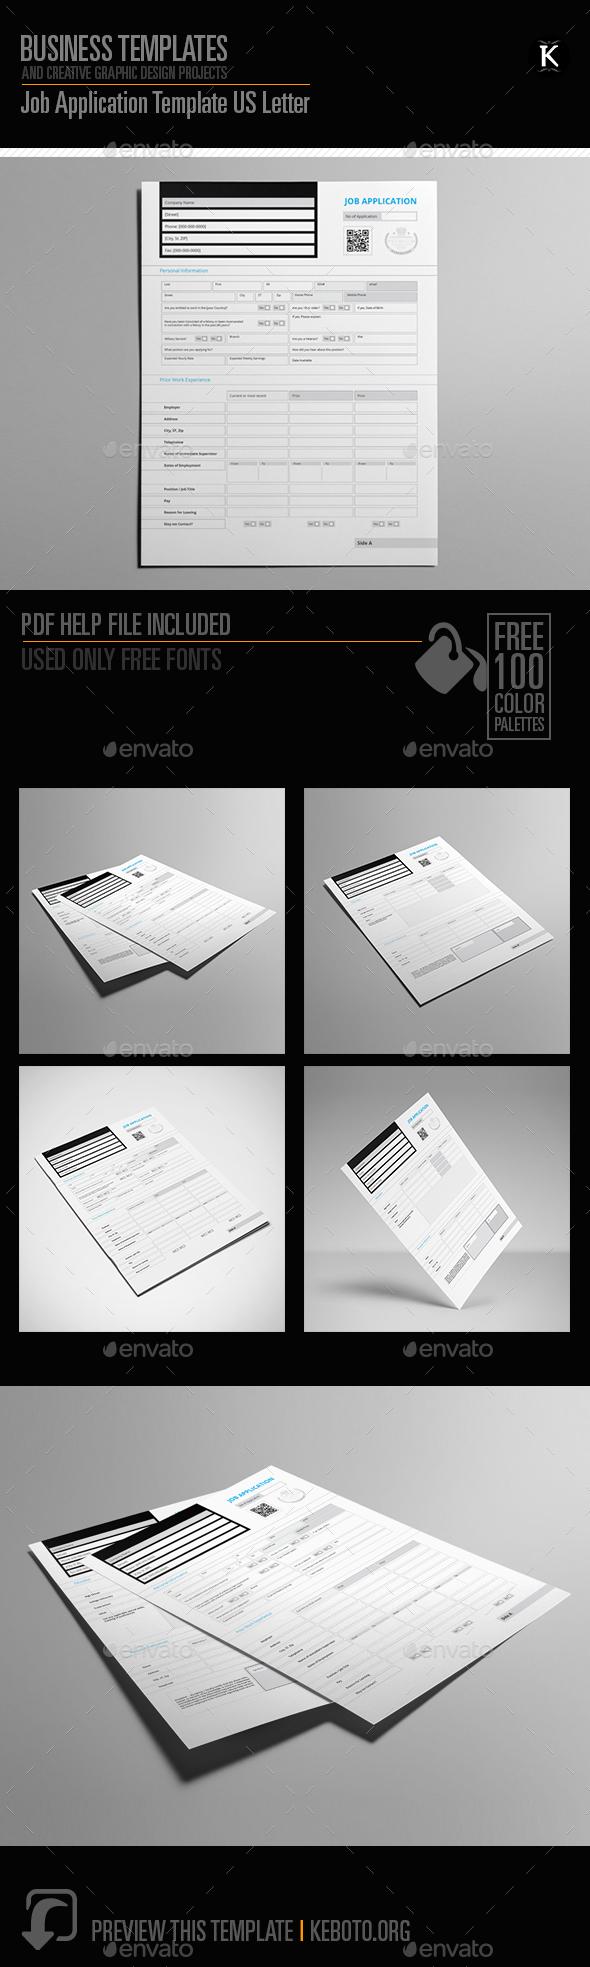 InDesign Job Application Graphics, Designs & Templates